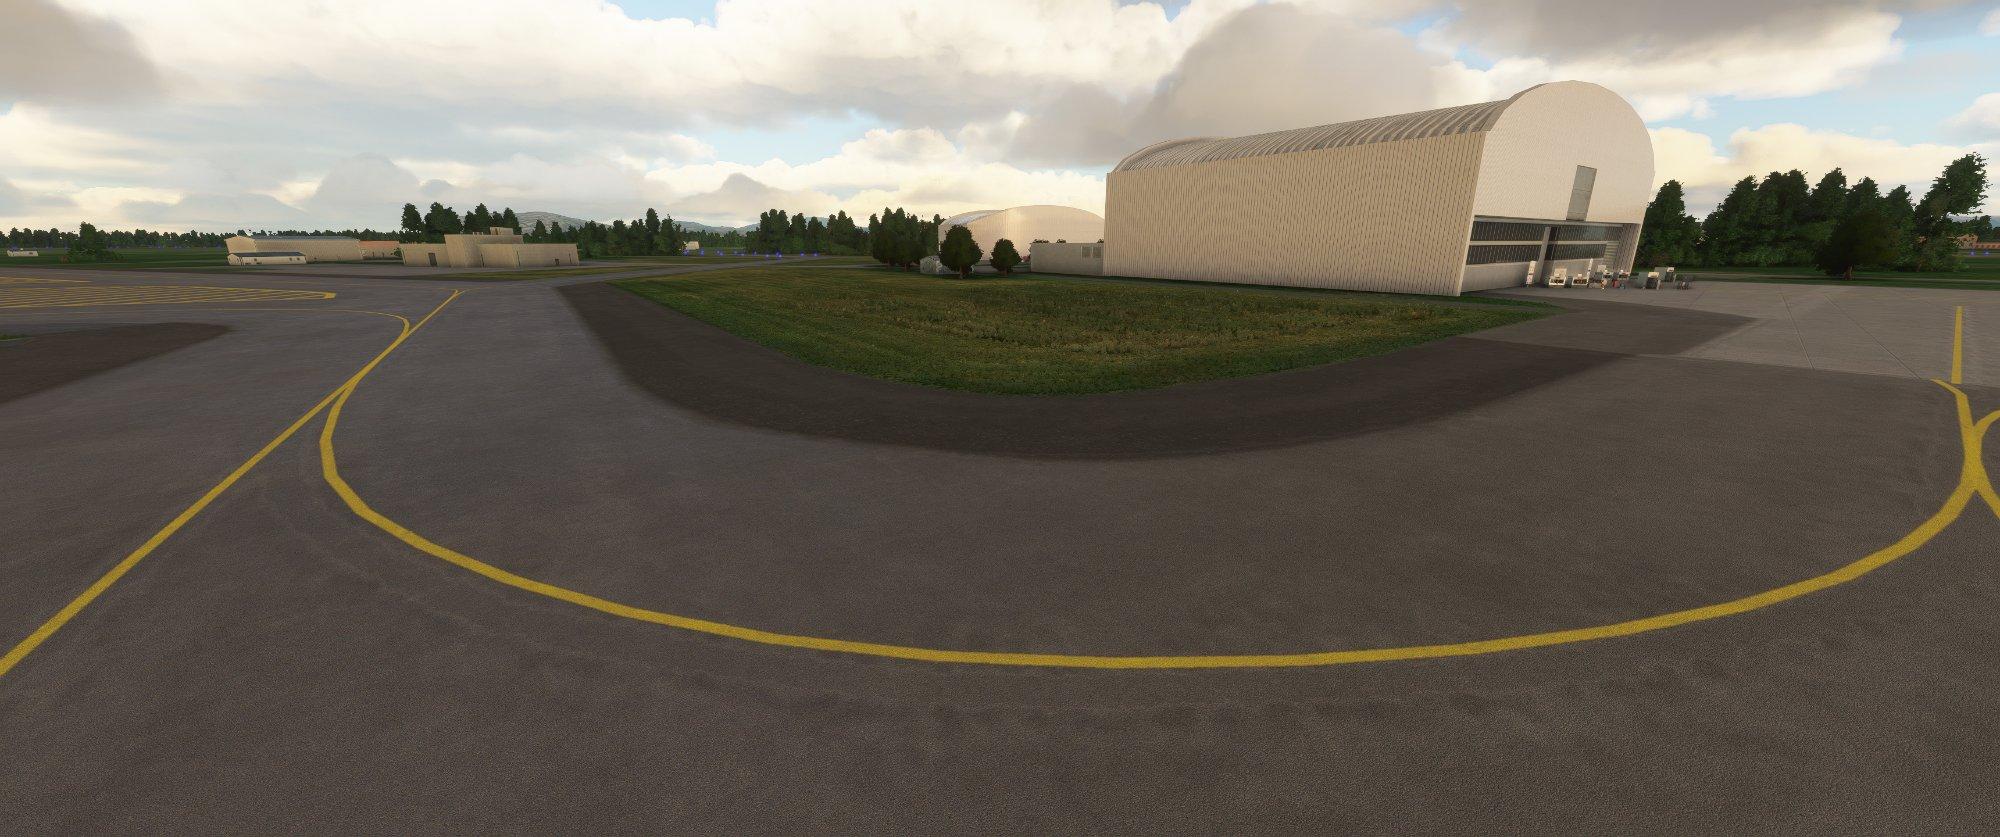 Microsoft Flight Simulator Screenshot 2020.11.09 - 17.42.31.30.jpg